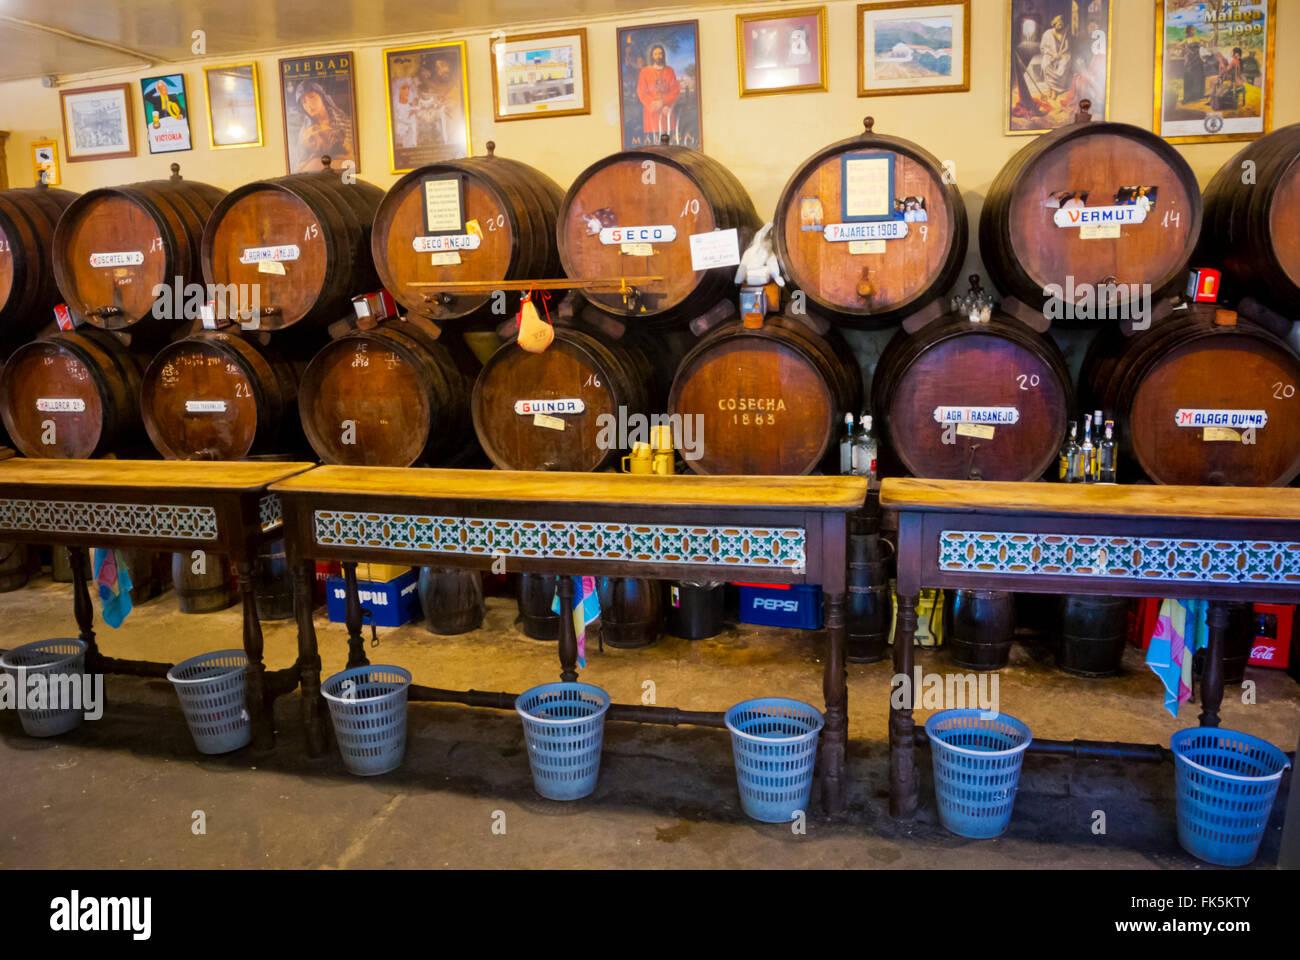 Barrels of wine, Antigua Casa de Guardia, wine bar, Malaga, Andalucia, Spain - Stock Image